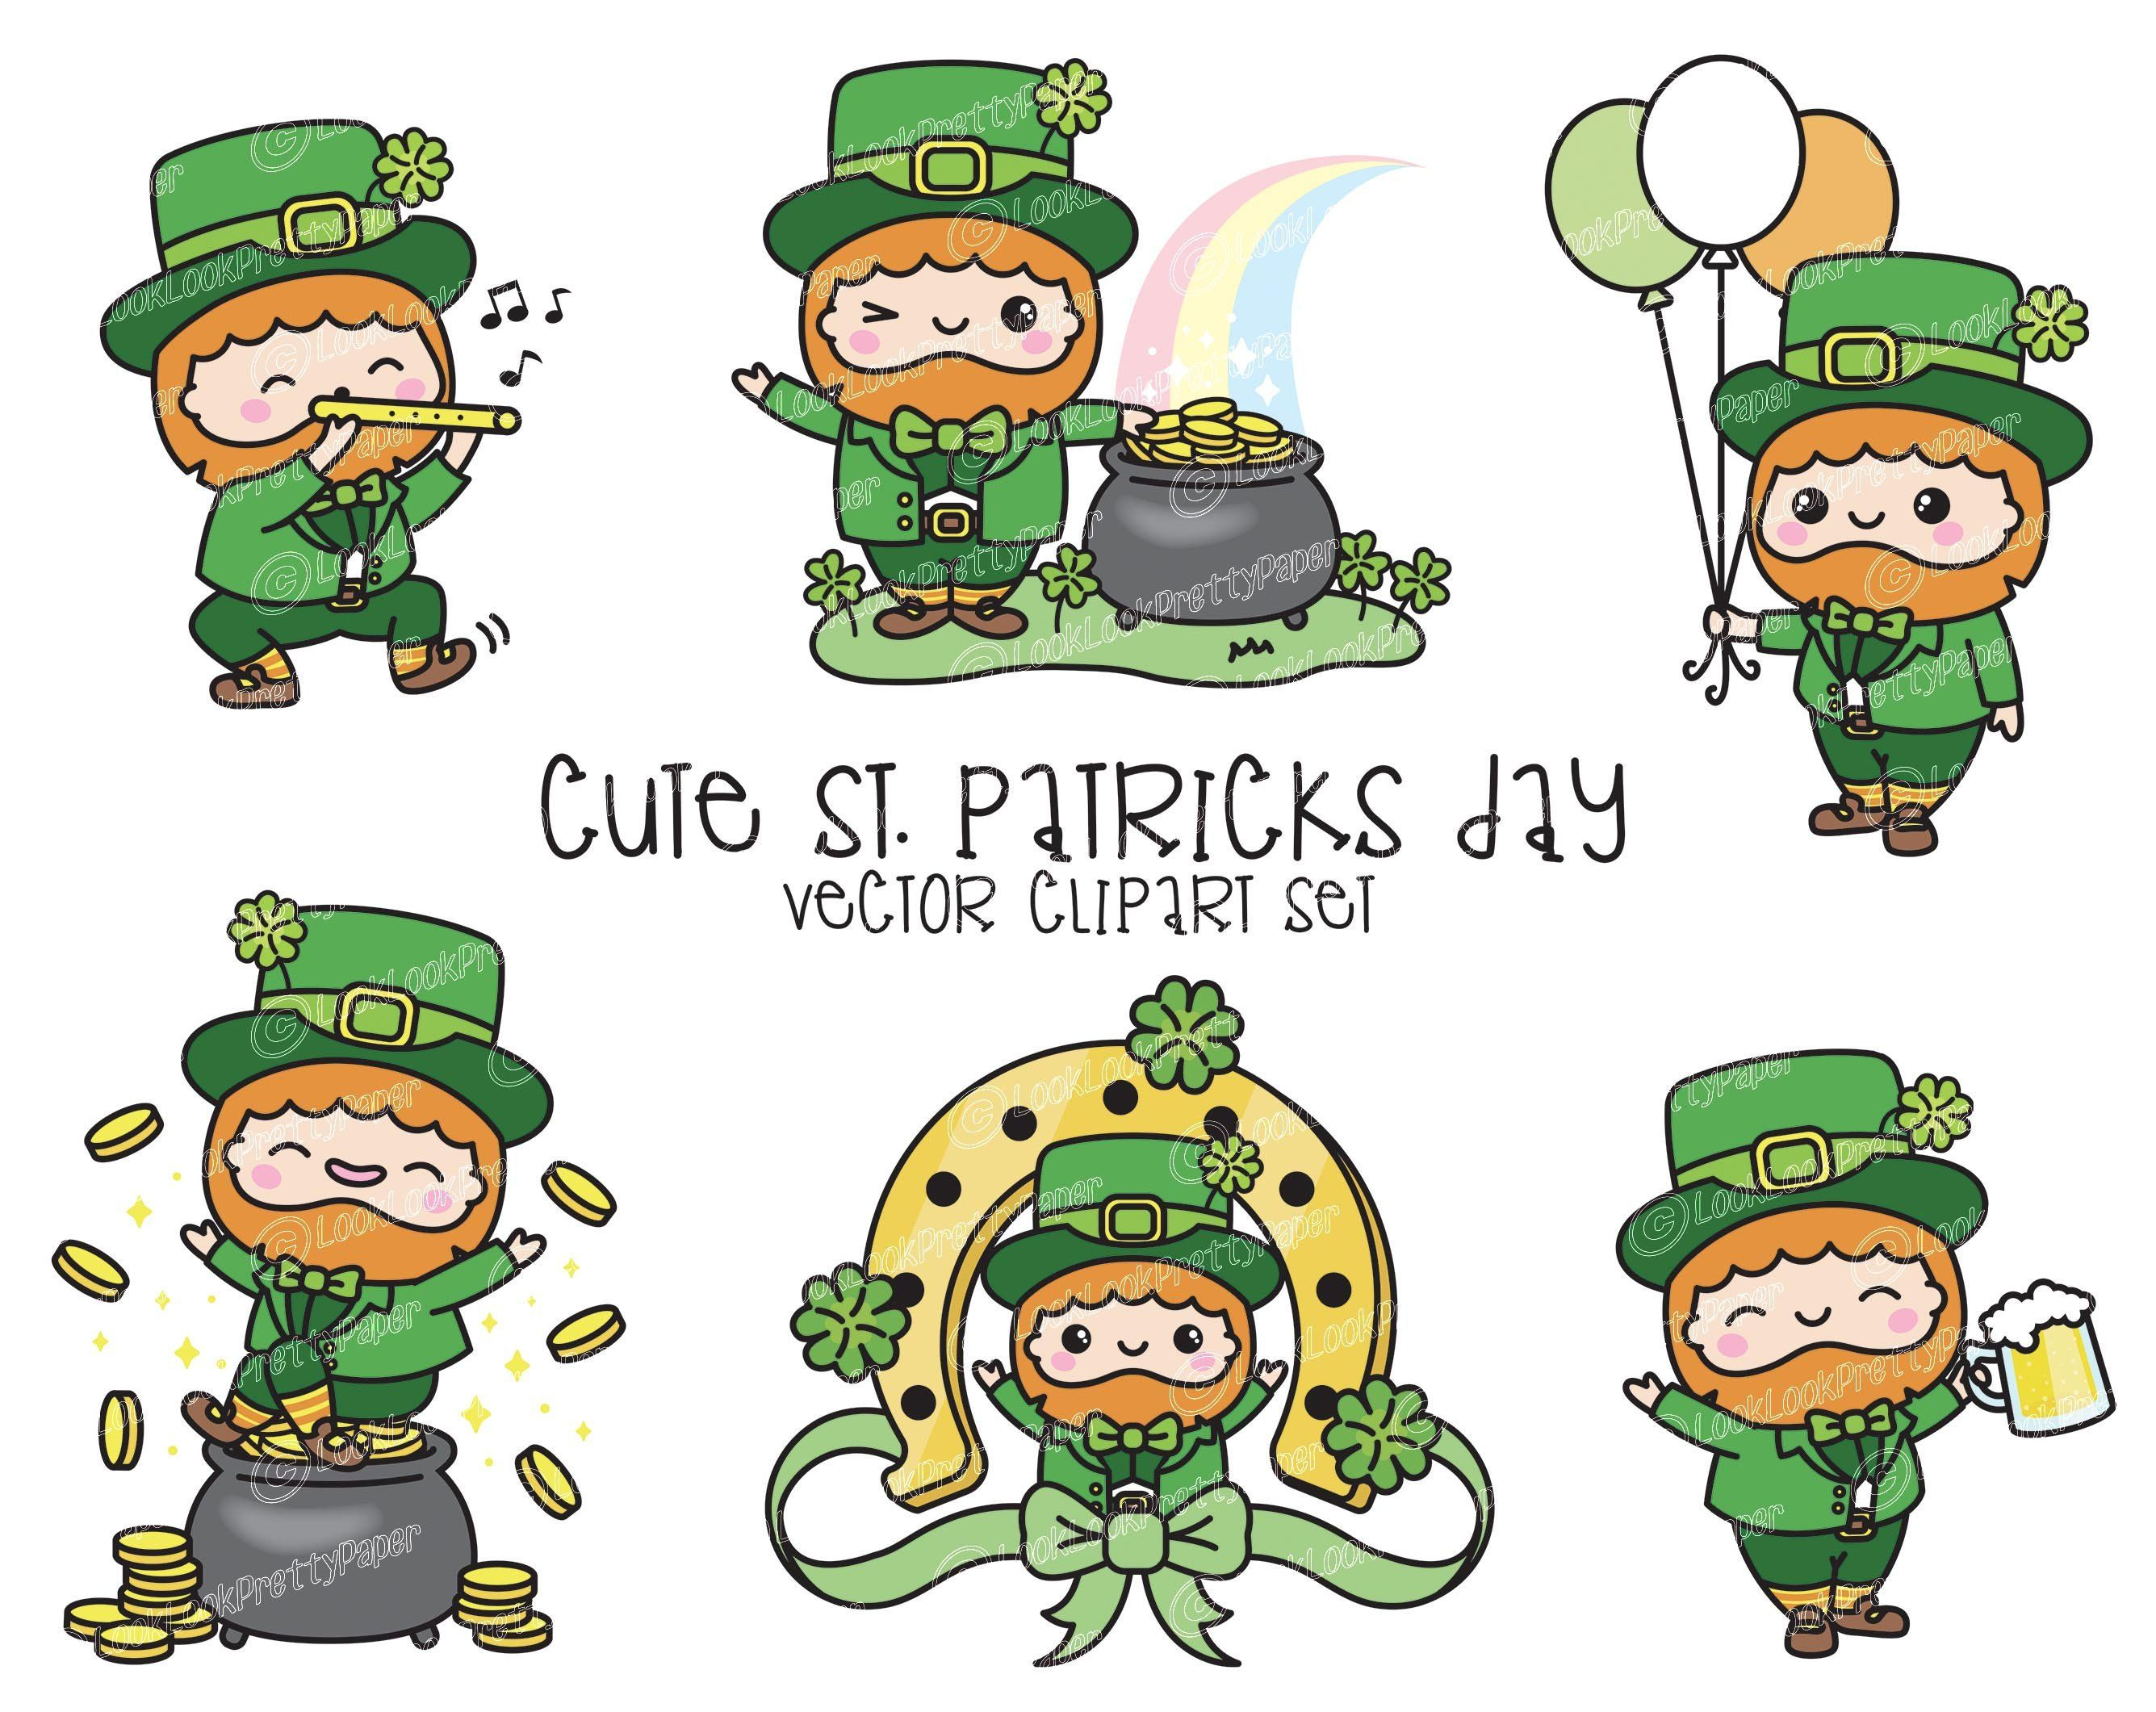 Premium Vector Clipart Kawaii St Patrick S Day Clipart Etsy Clip Art St Patricks Day Clipart Leprechaun Clipart